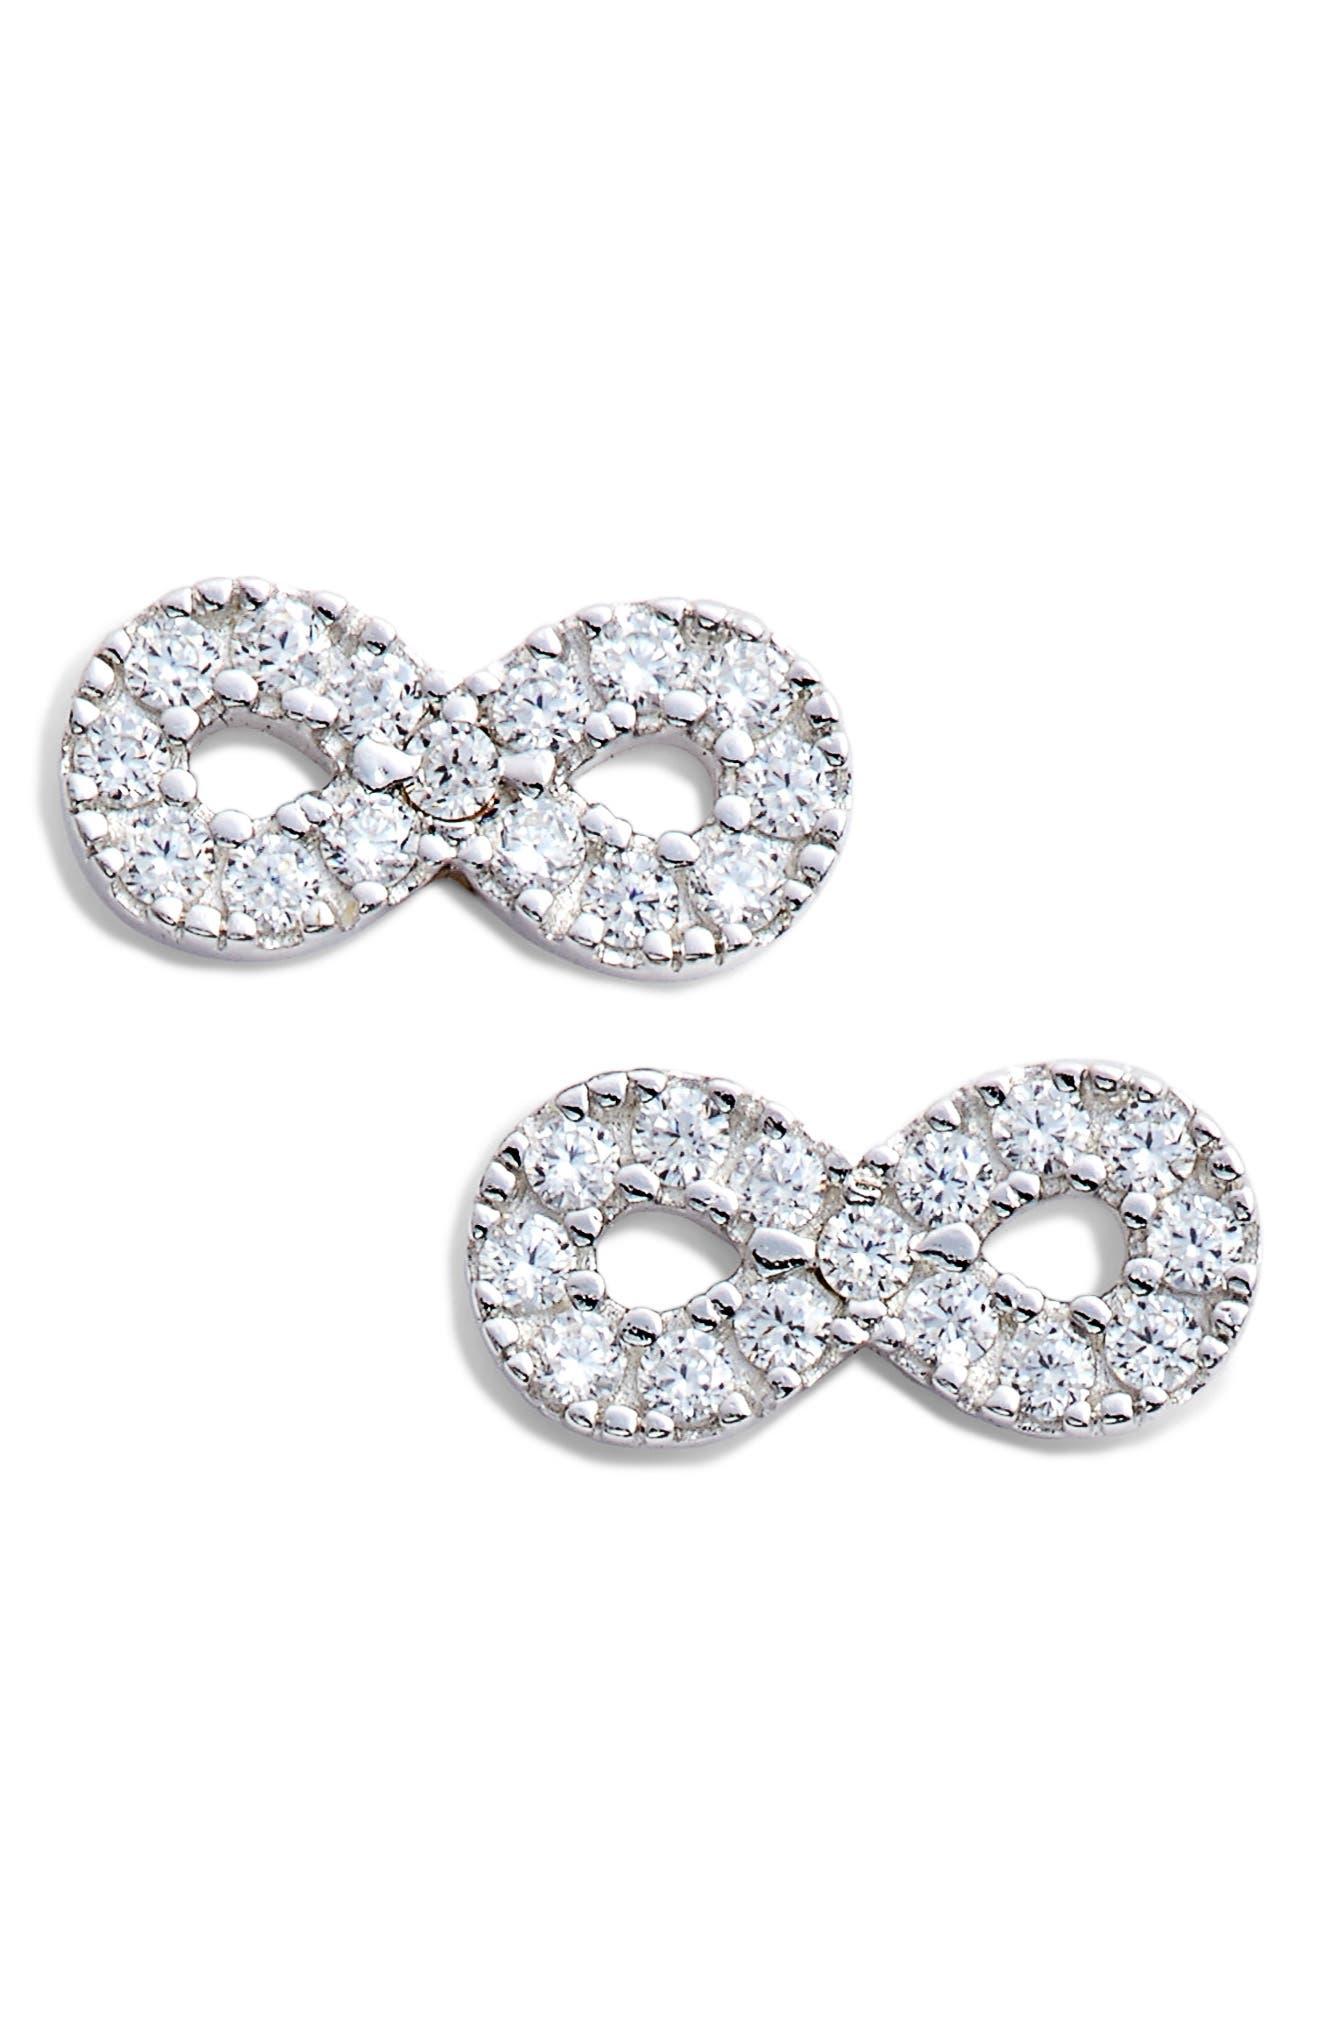 Infinity Stud Earrings,                         Main,                         color, Platinum